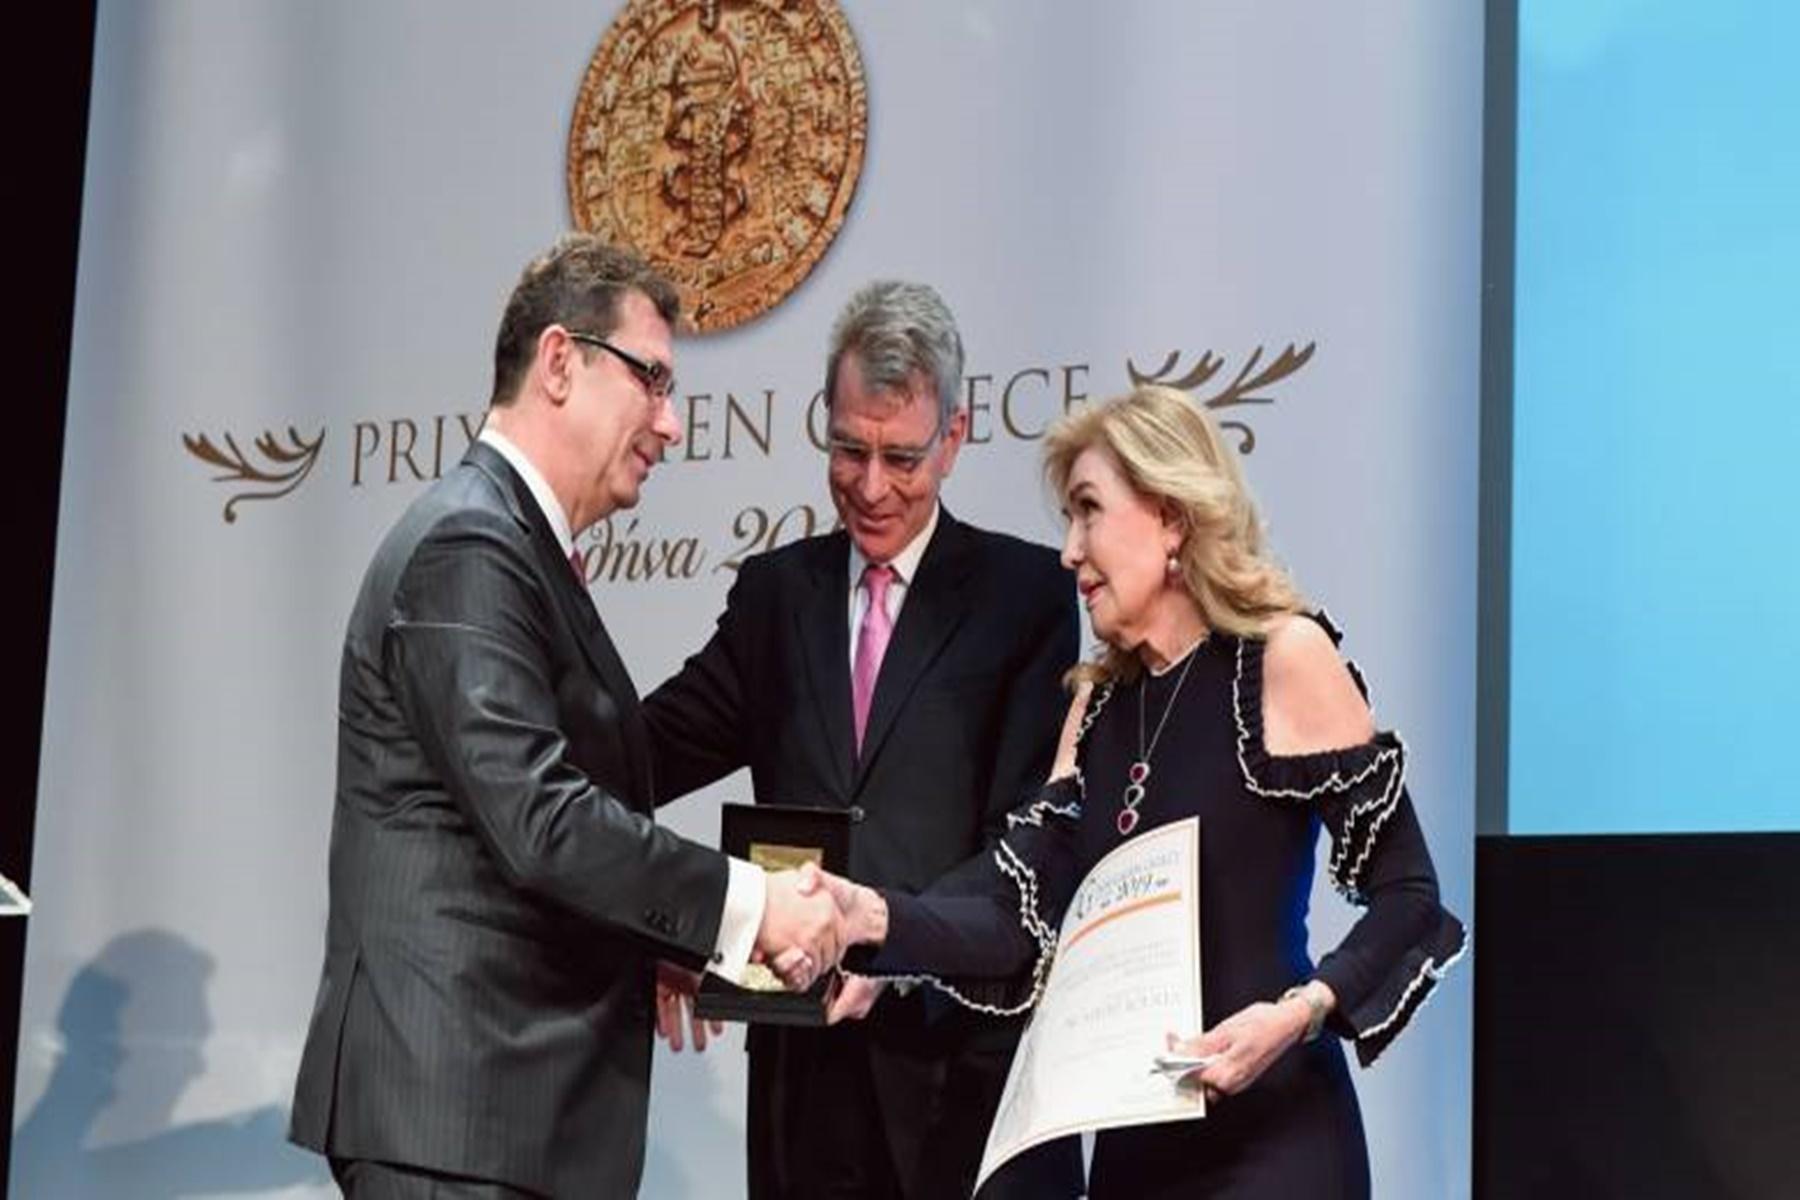 Prix Galien Greece : Δίνει Νόμπελ υπό το πρίσμα της πανδημίας